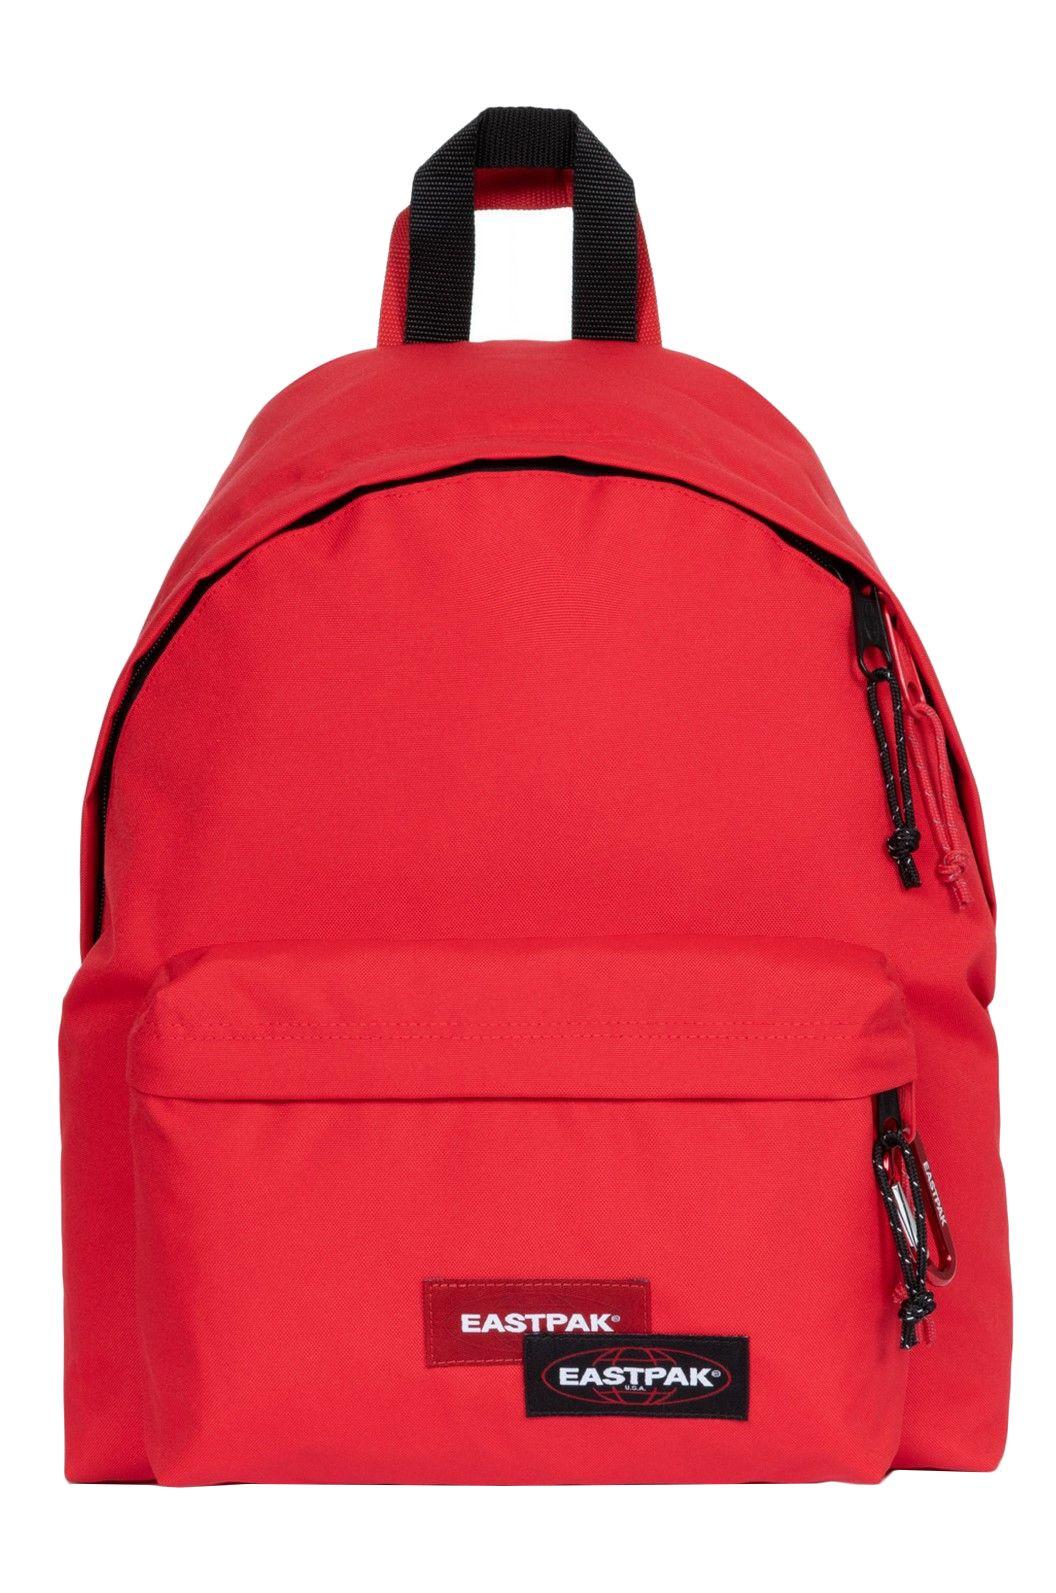 Eastpak Backpack PADDED PAK'R Sailor Double